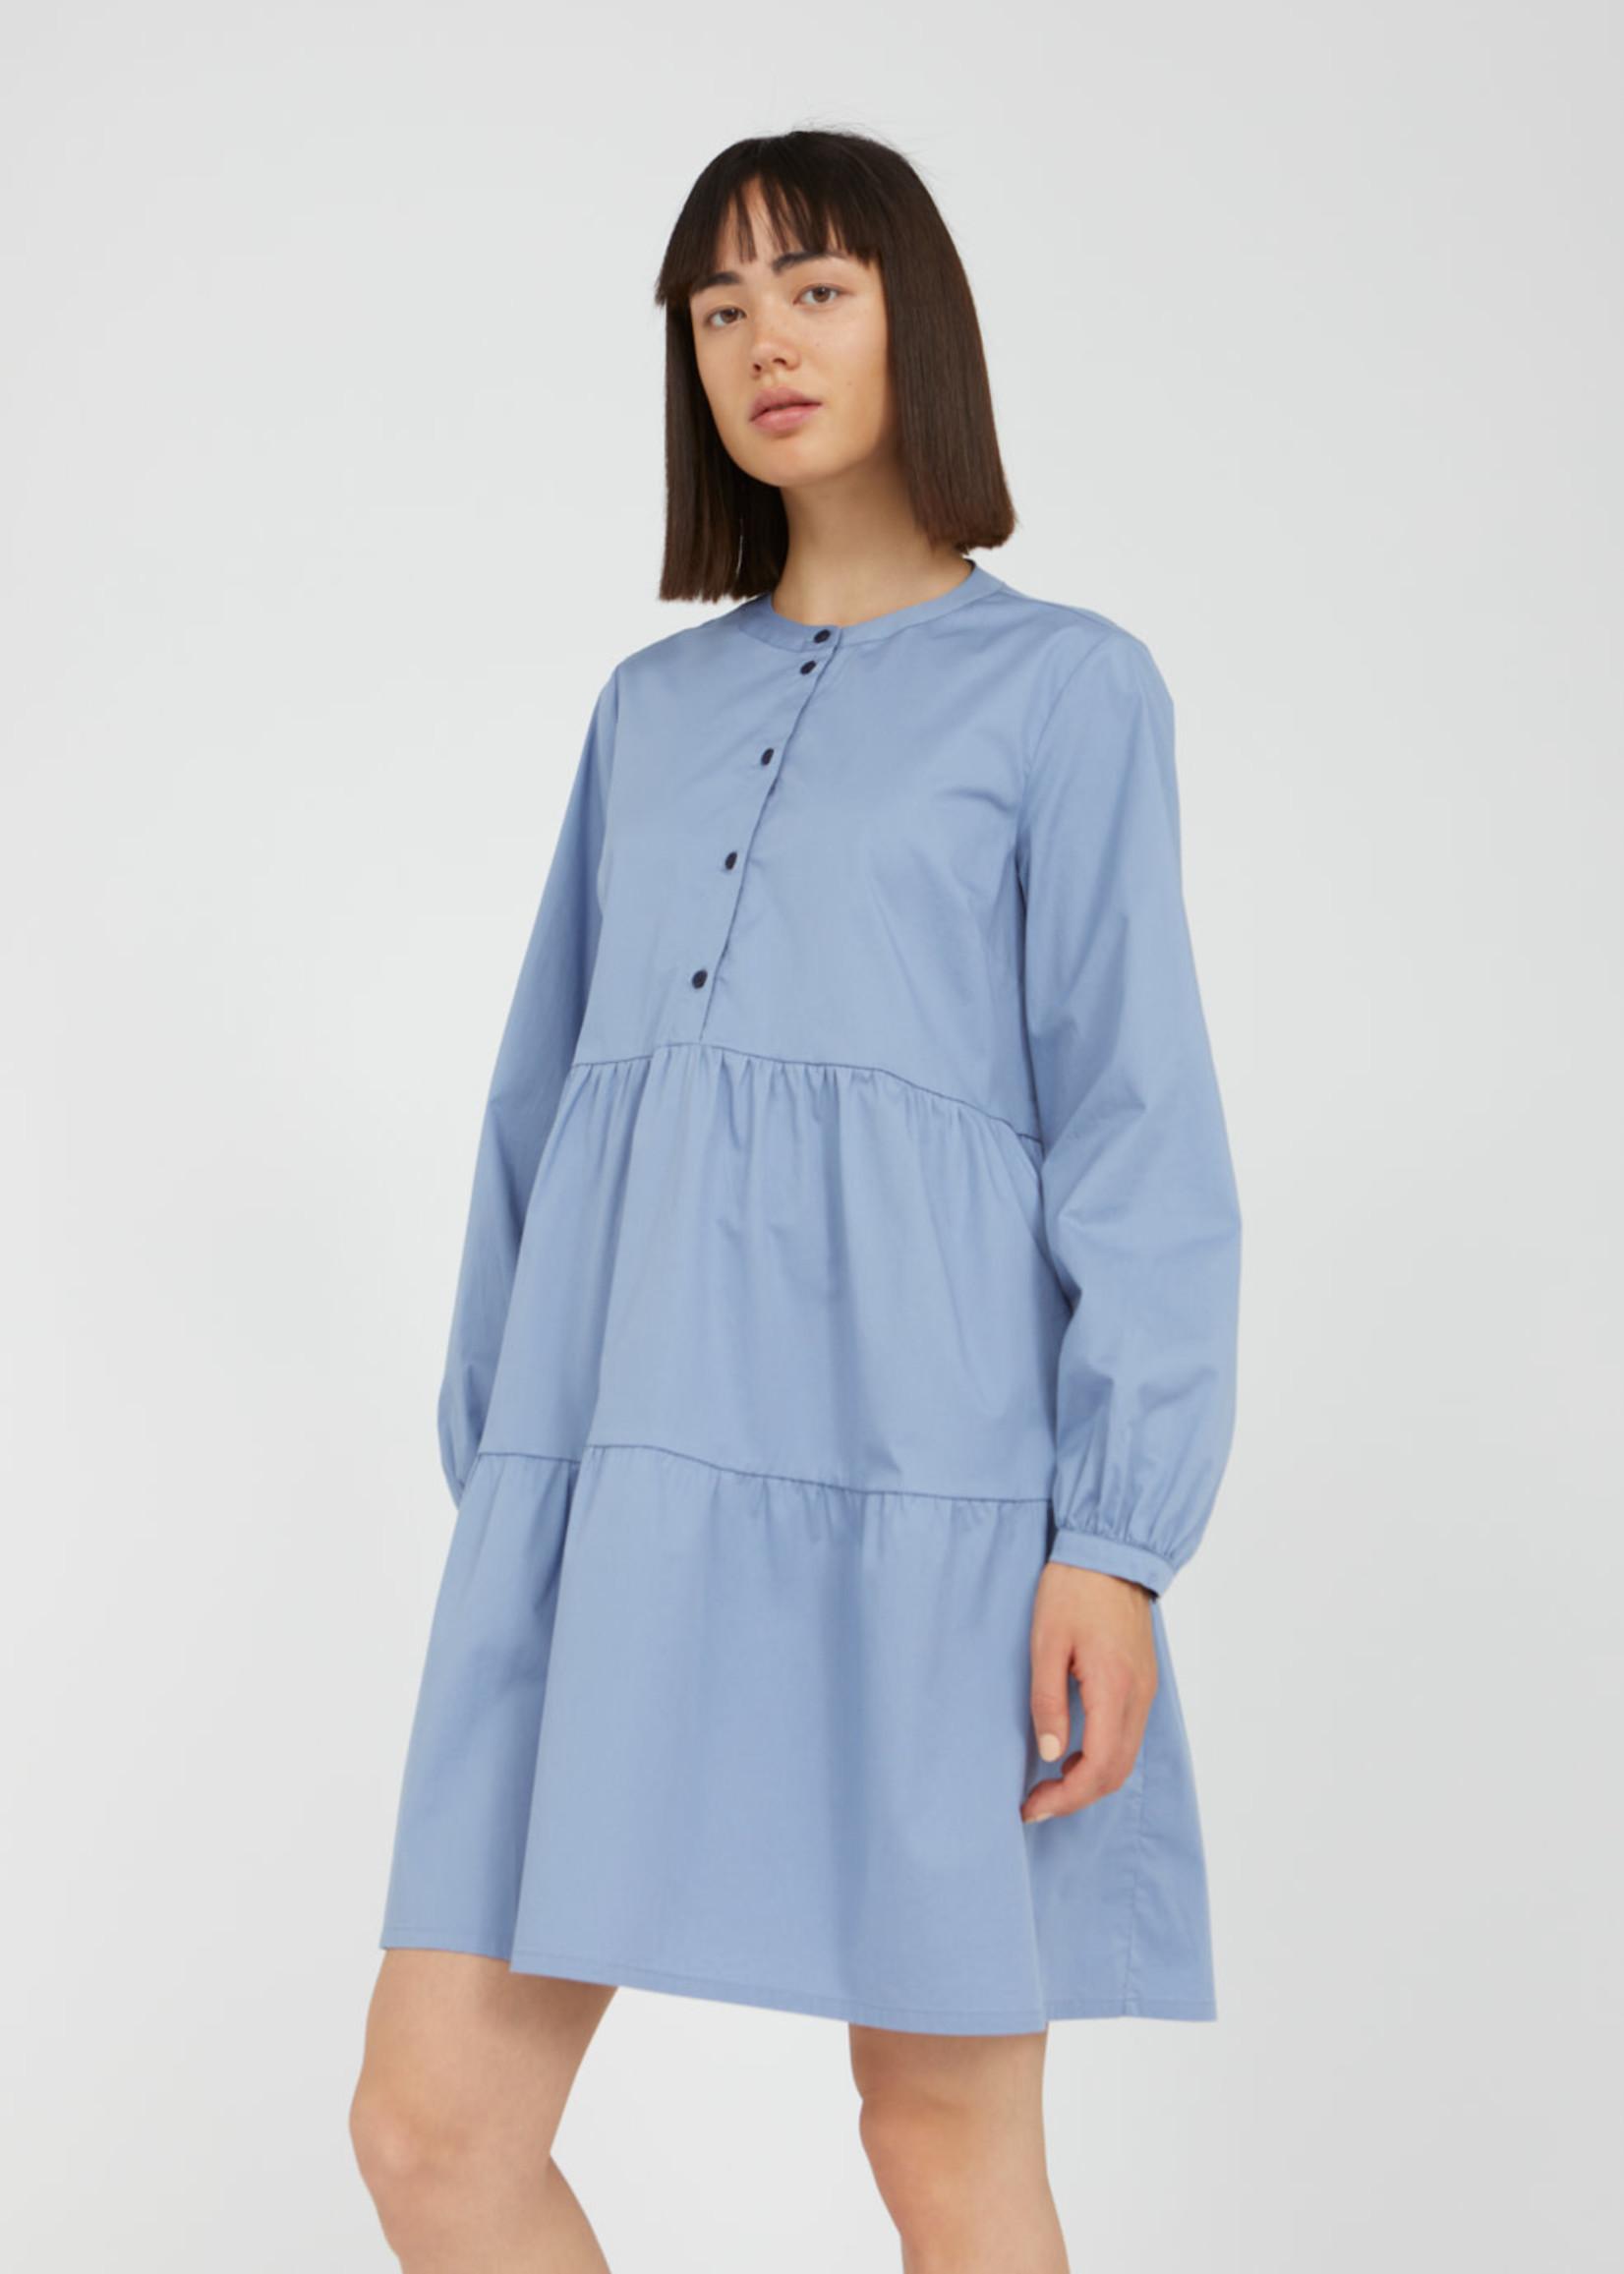 Armedangels Kobenhaavn Dress